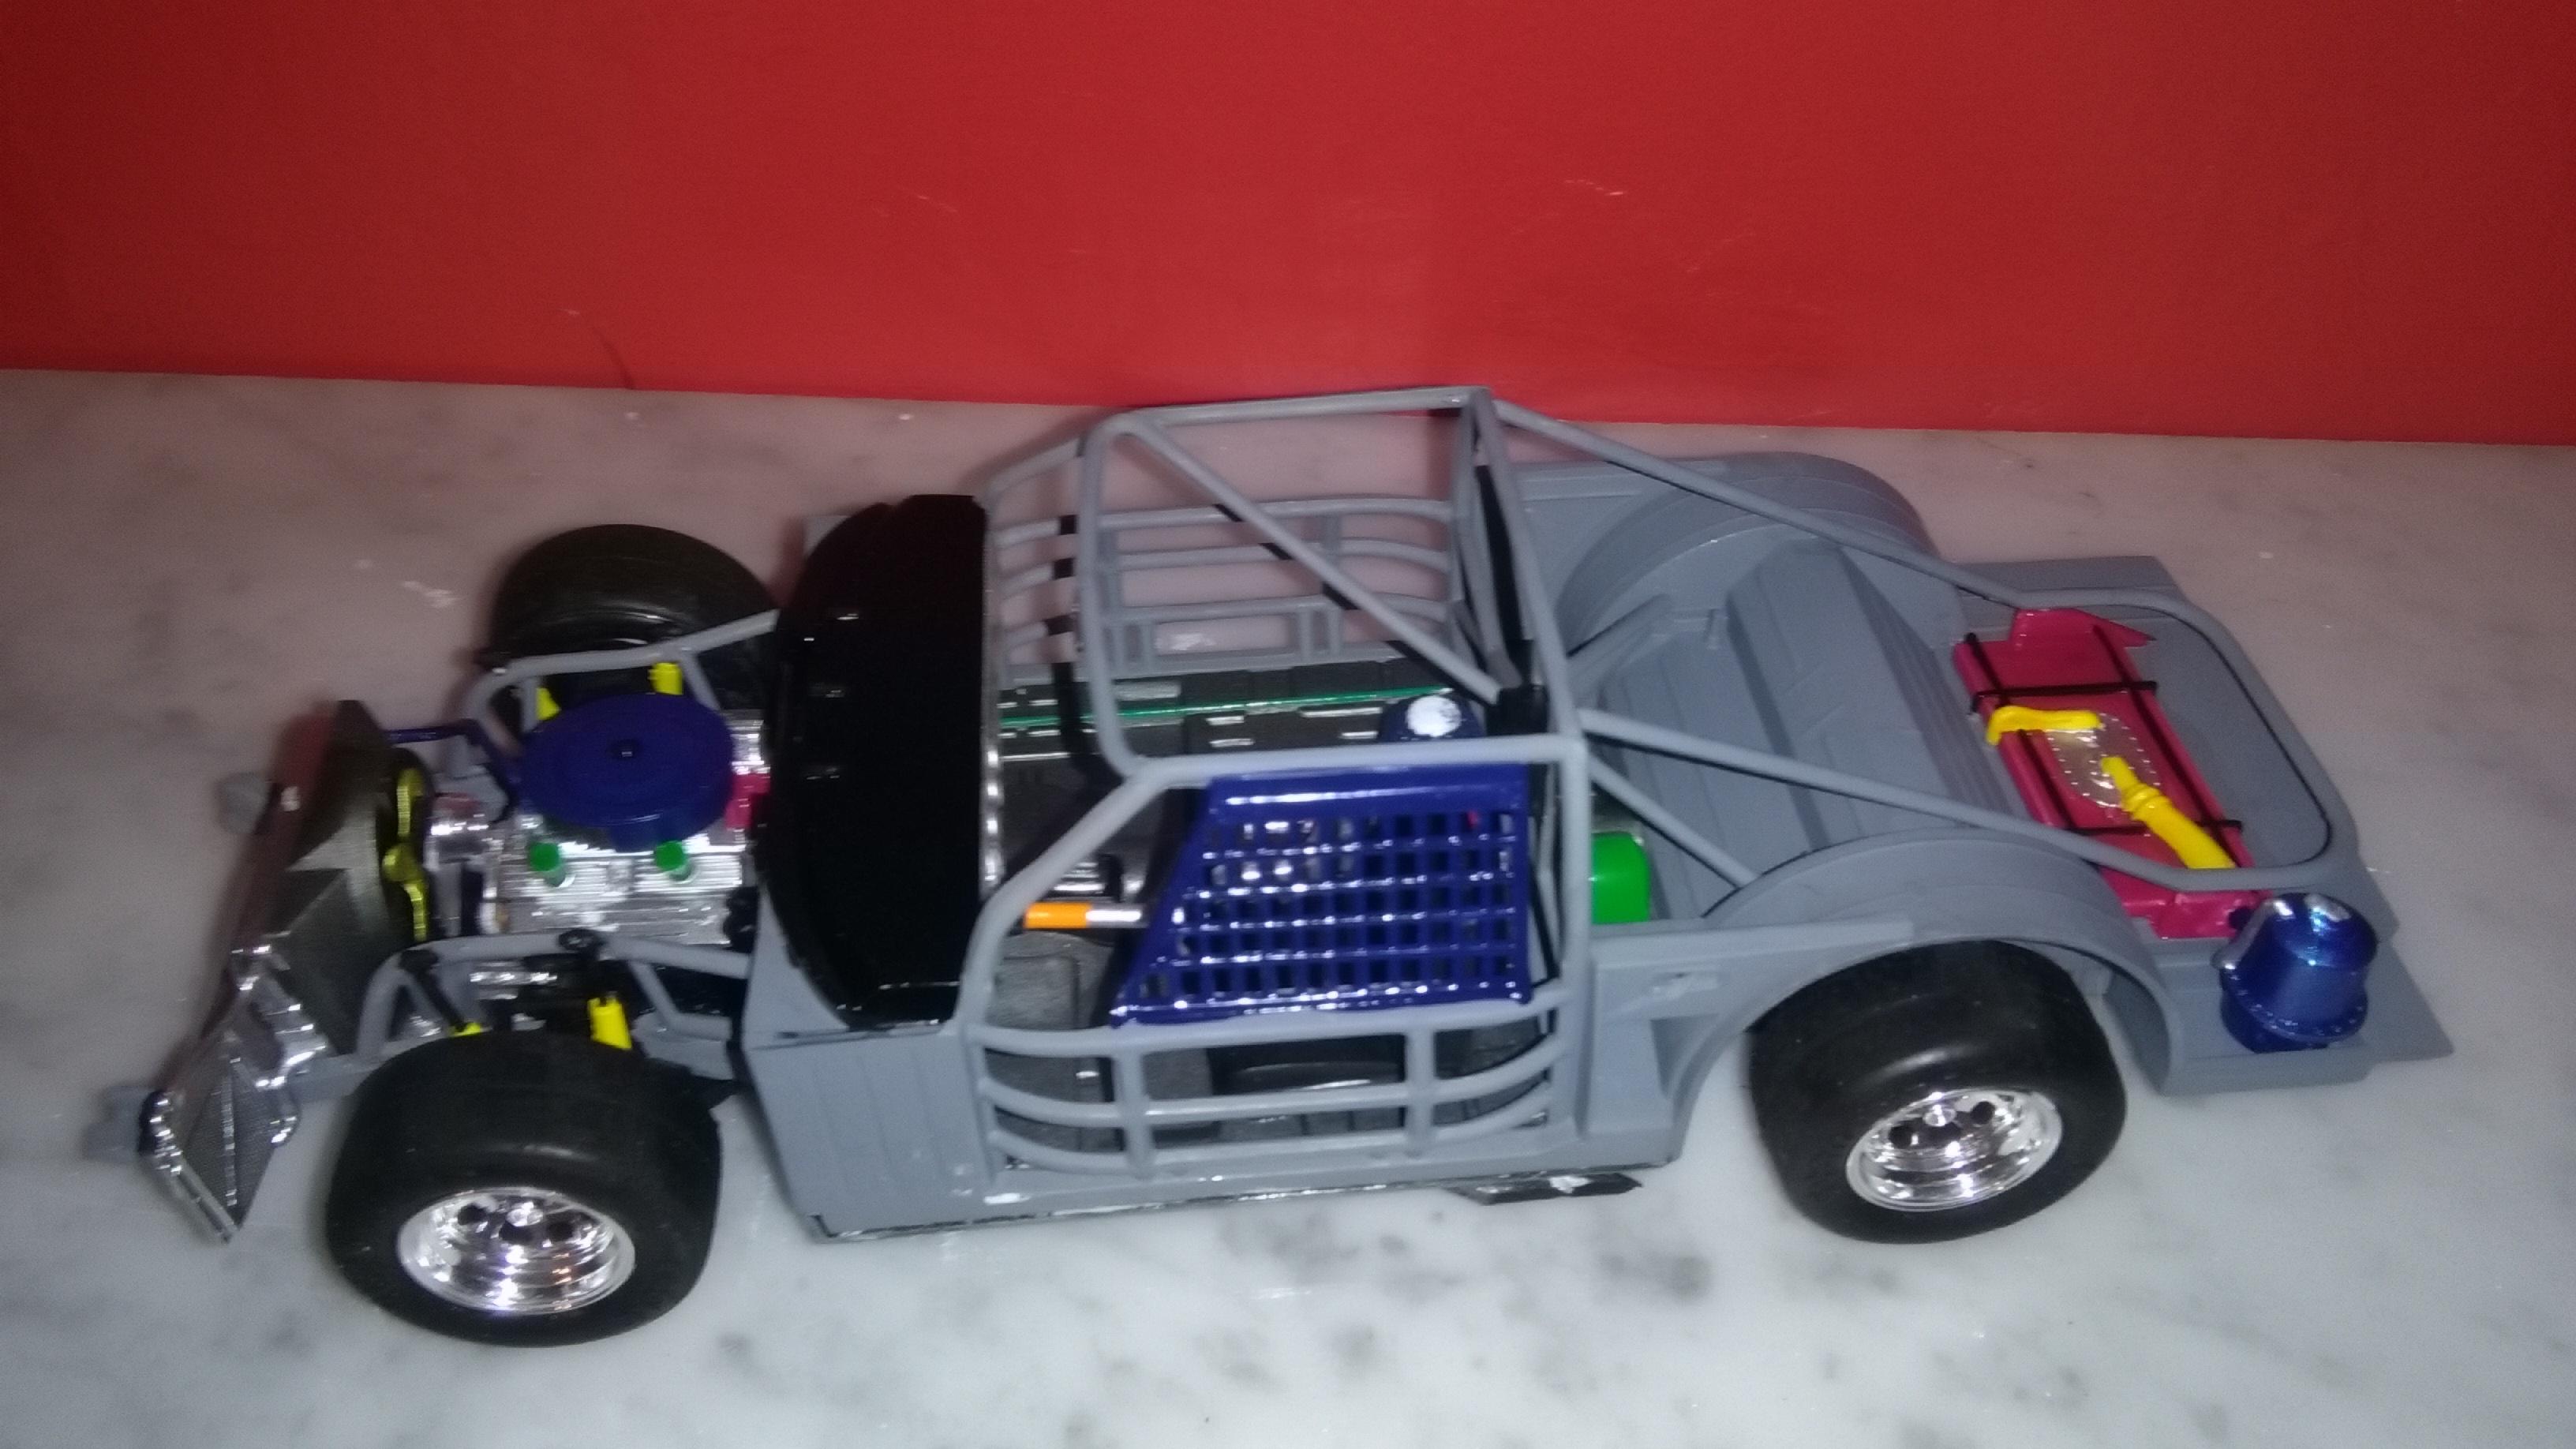 Chevy Monte-Carlo 1983 #11 Darrell Waltrip Pepsi  897480IMG20170422213541